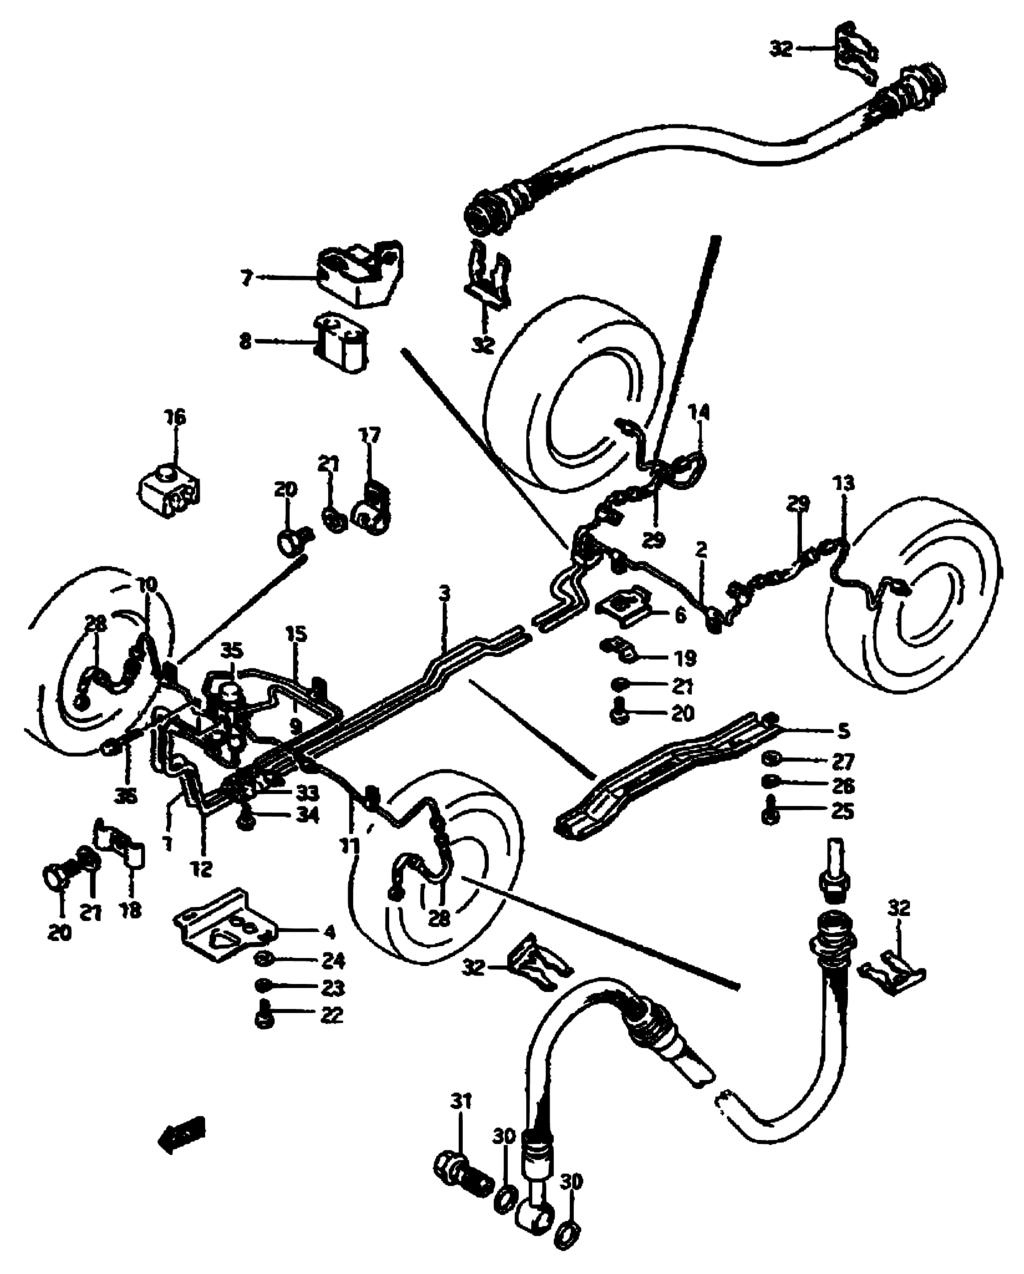 NEW Brake Proportioning Valve for Suzuki SA310 85-88